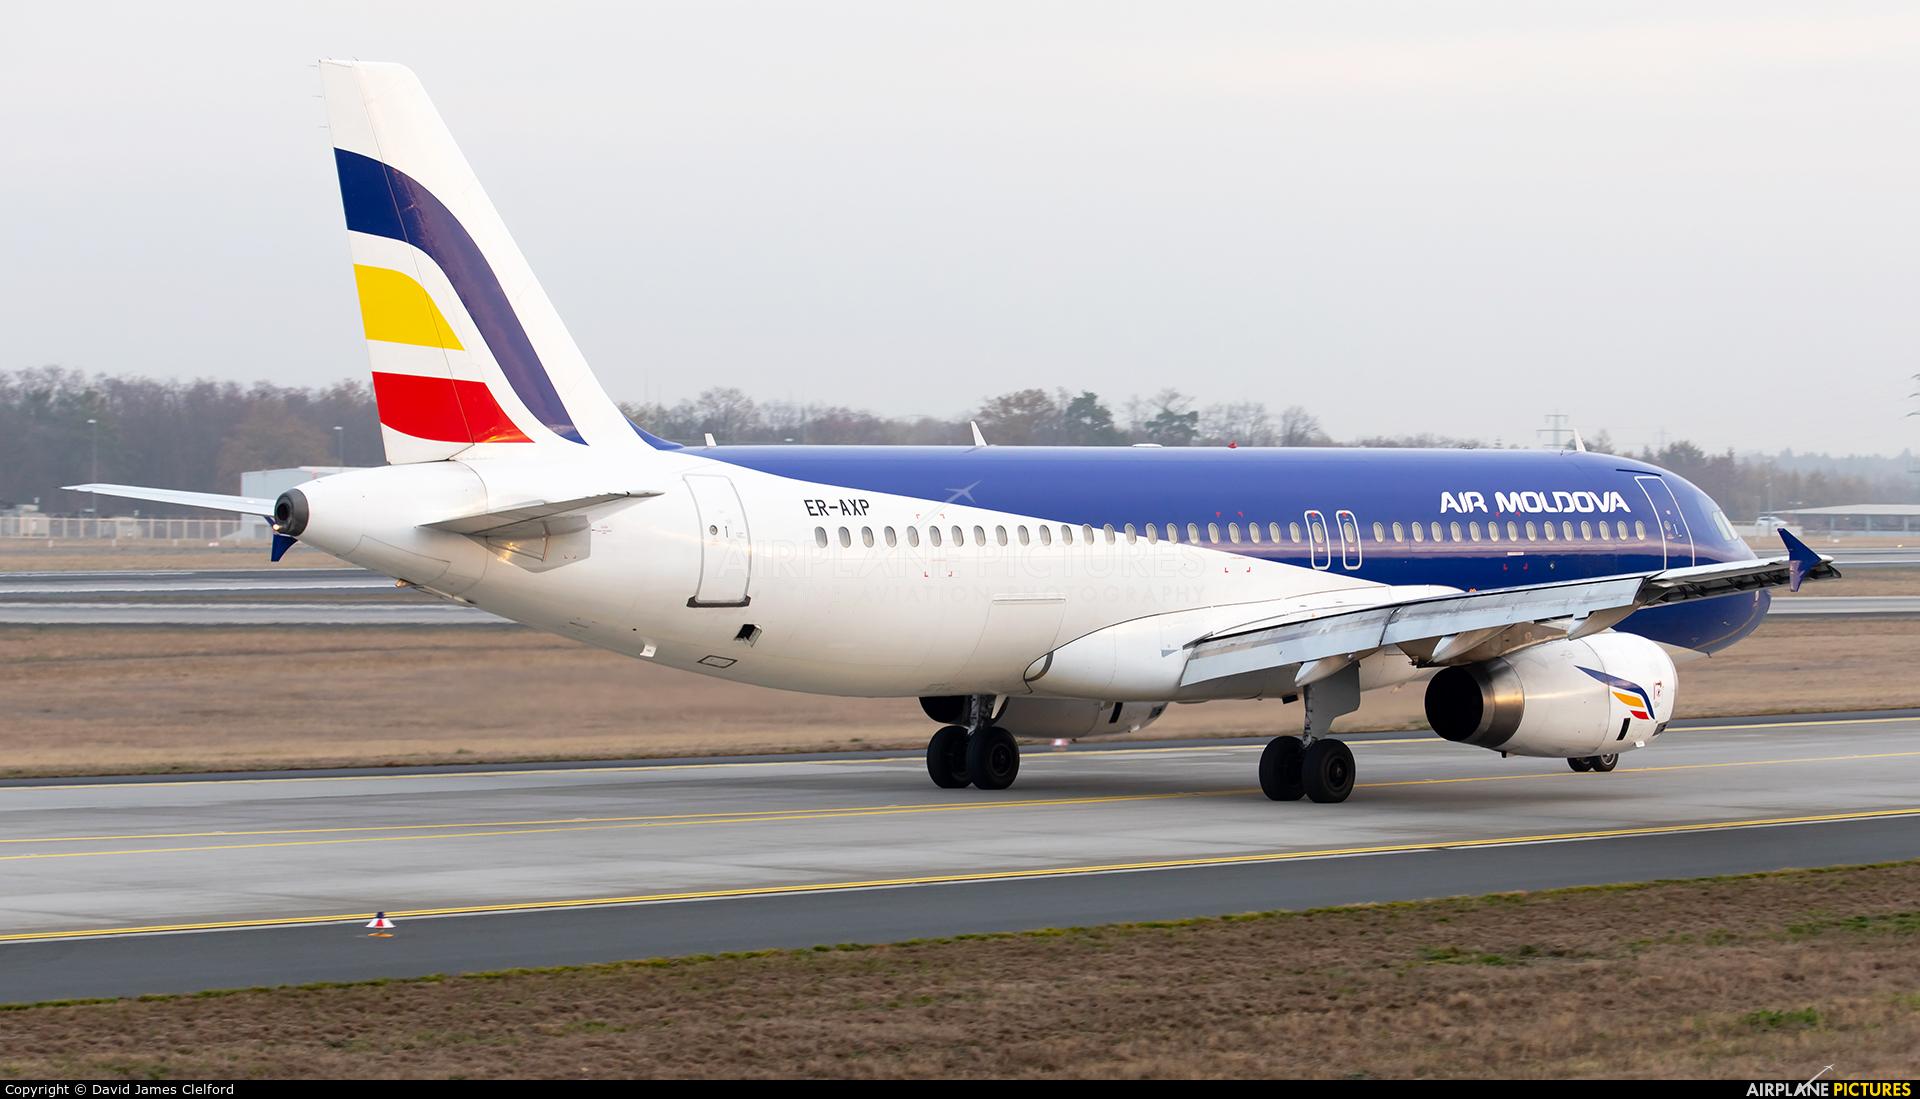 Air Moldova ER-AXV aircraft at Frankfurt